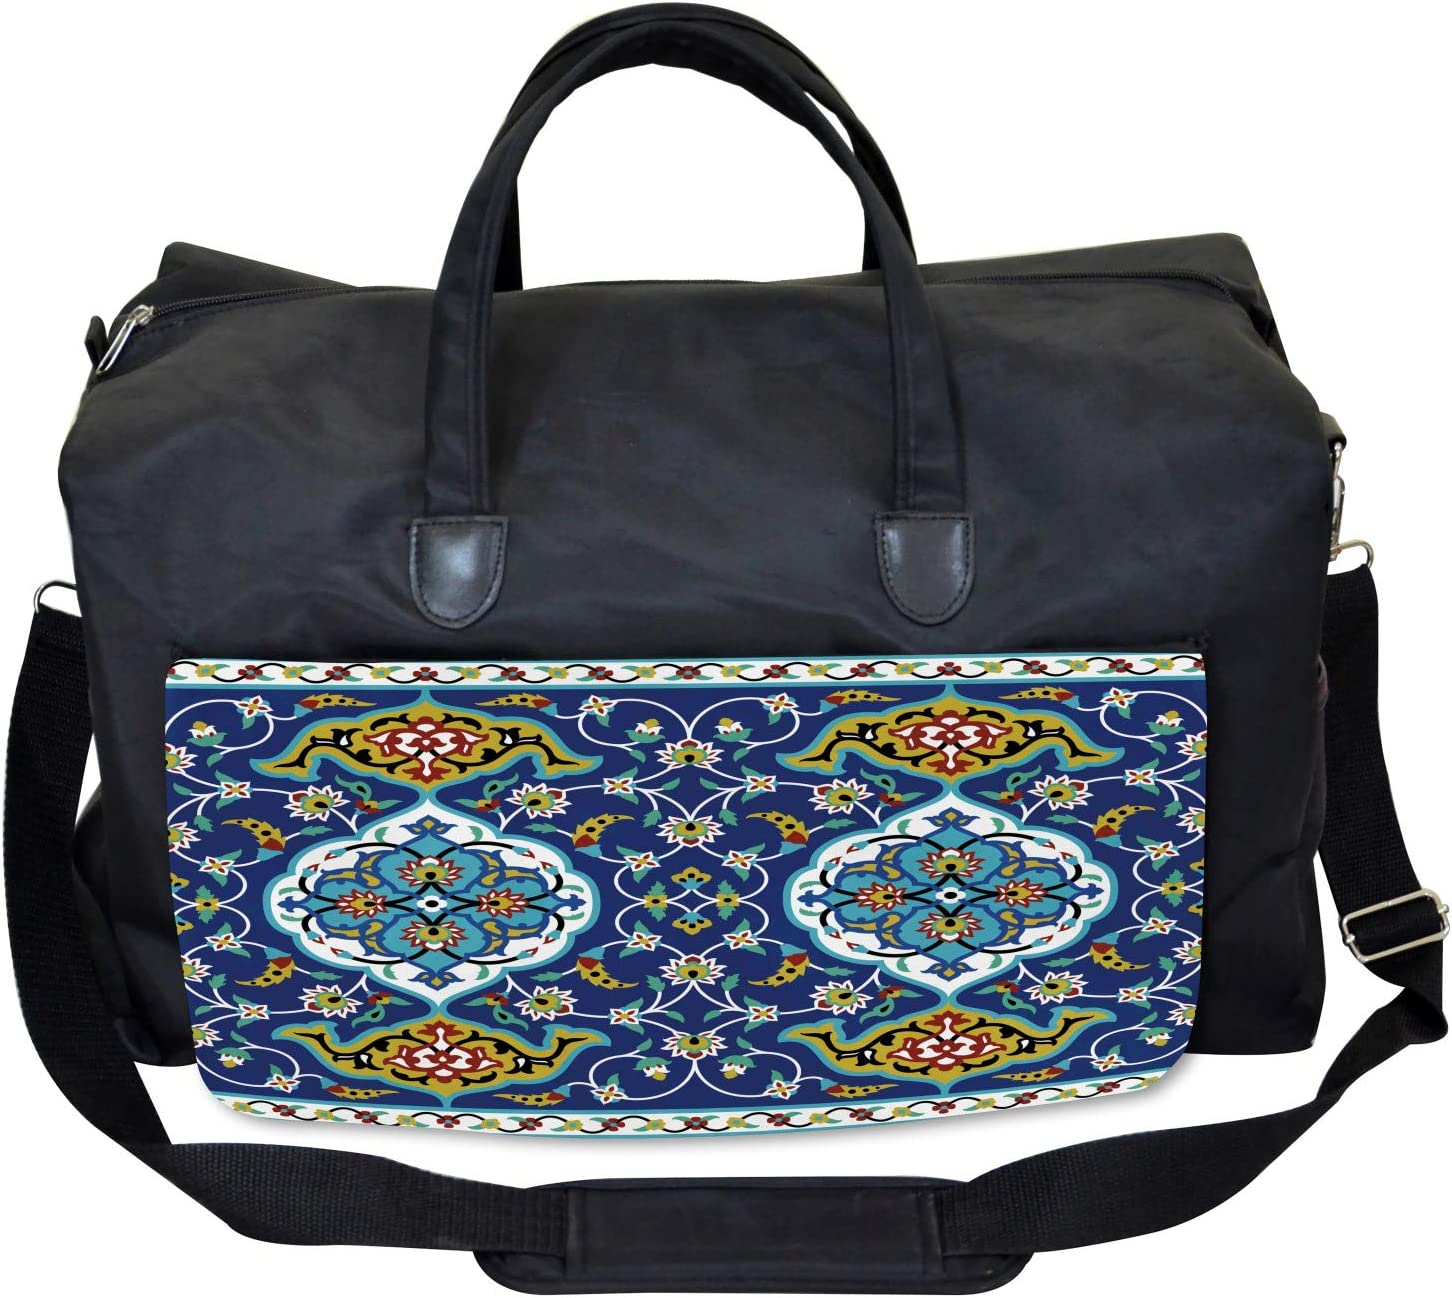 Ambesonne Vintage Gym Bag Large Weekender Carry-on Oriental Tile Effects